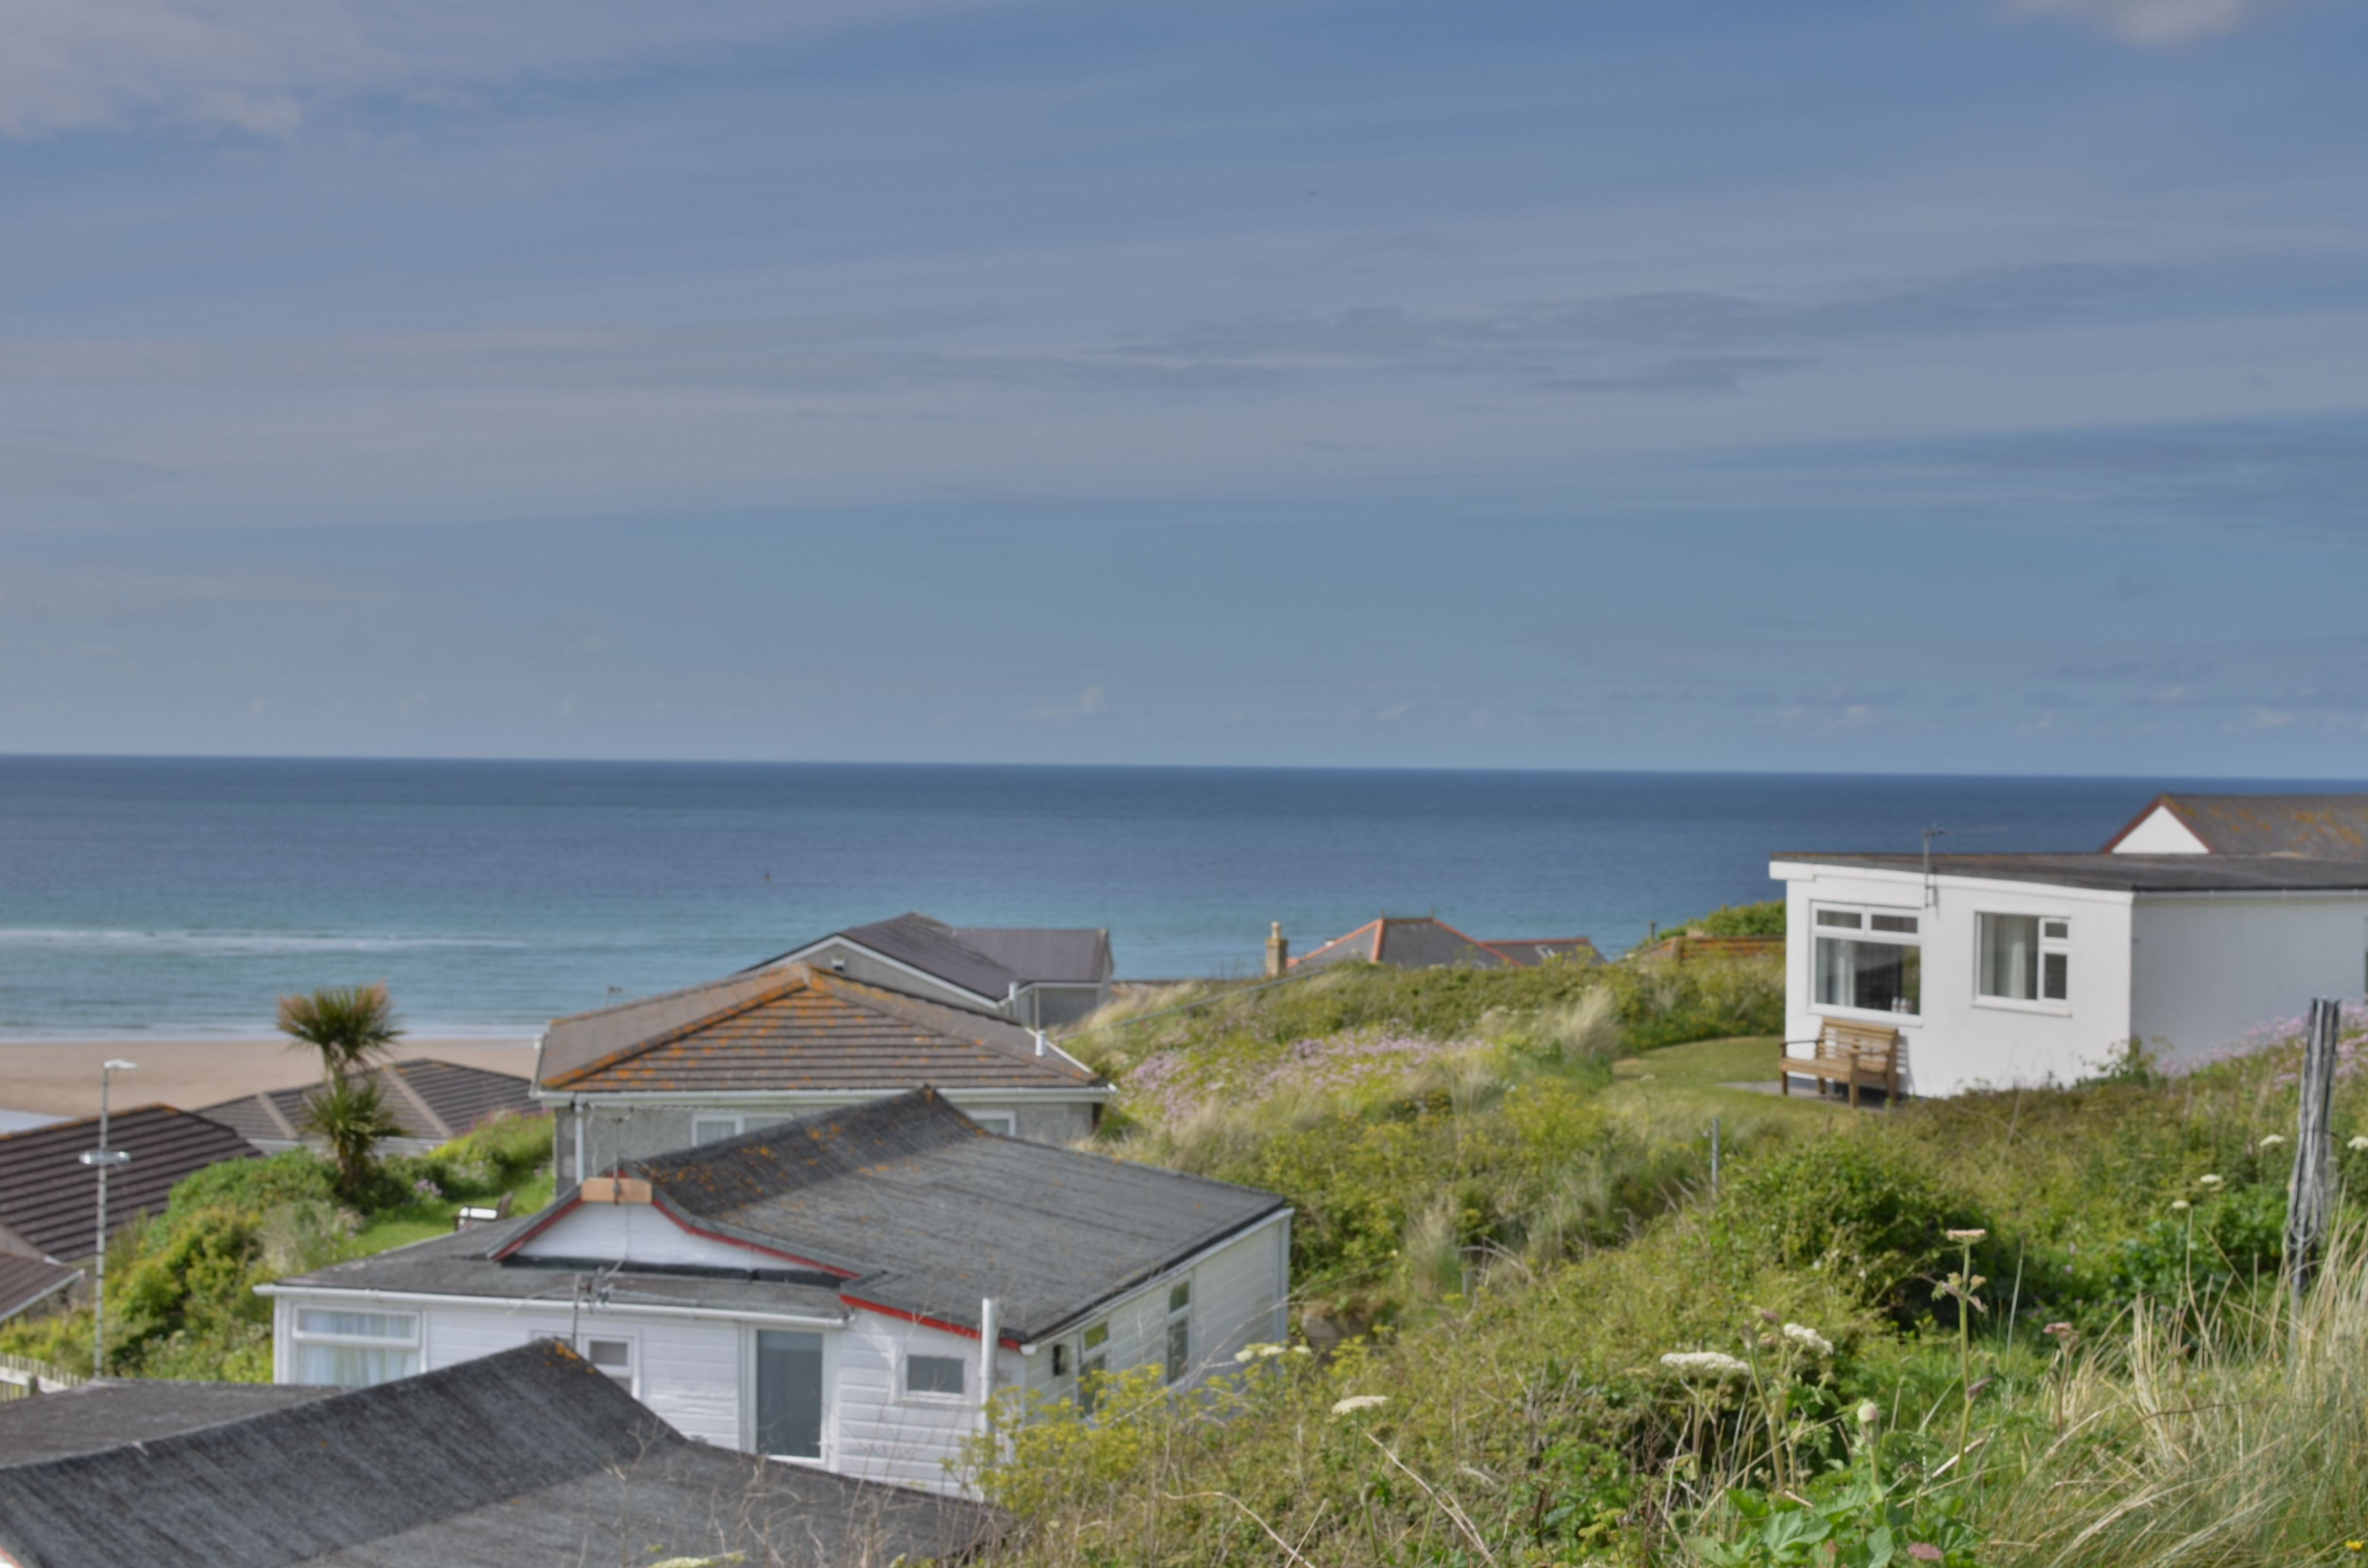 Panoramic View (Right)